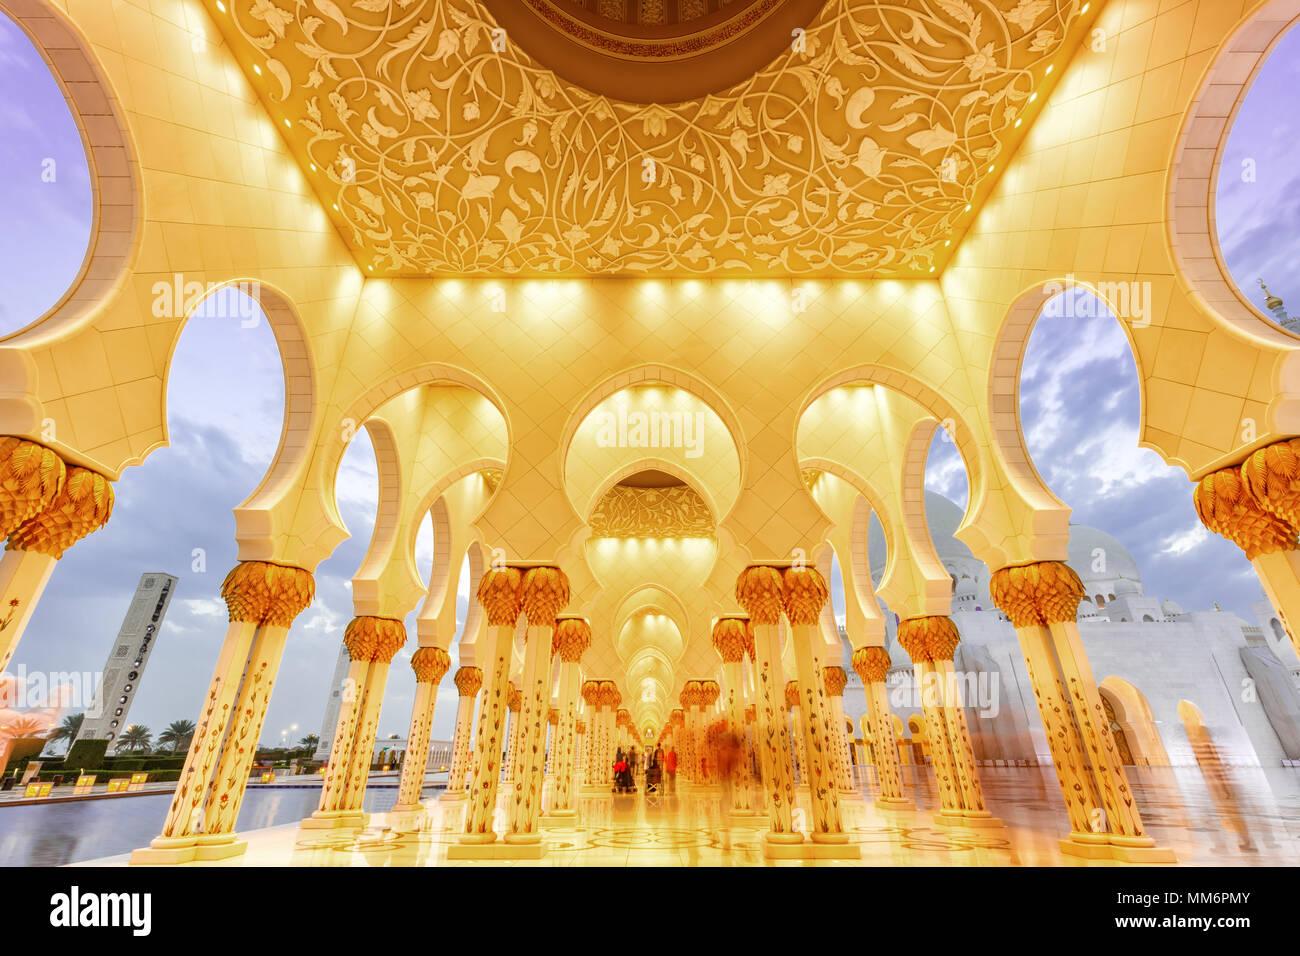 Sheikh Zayed Grande Moschea di Abu Dhabi colonne Emirati Arabi Uniti EMIRATI ARABI UNITI Immagini Stock